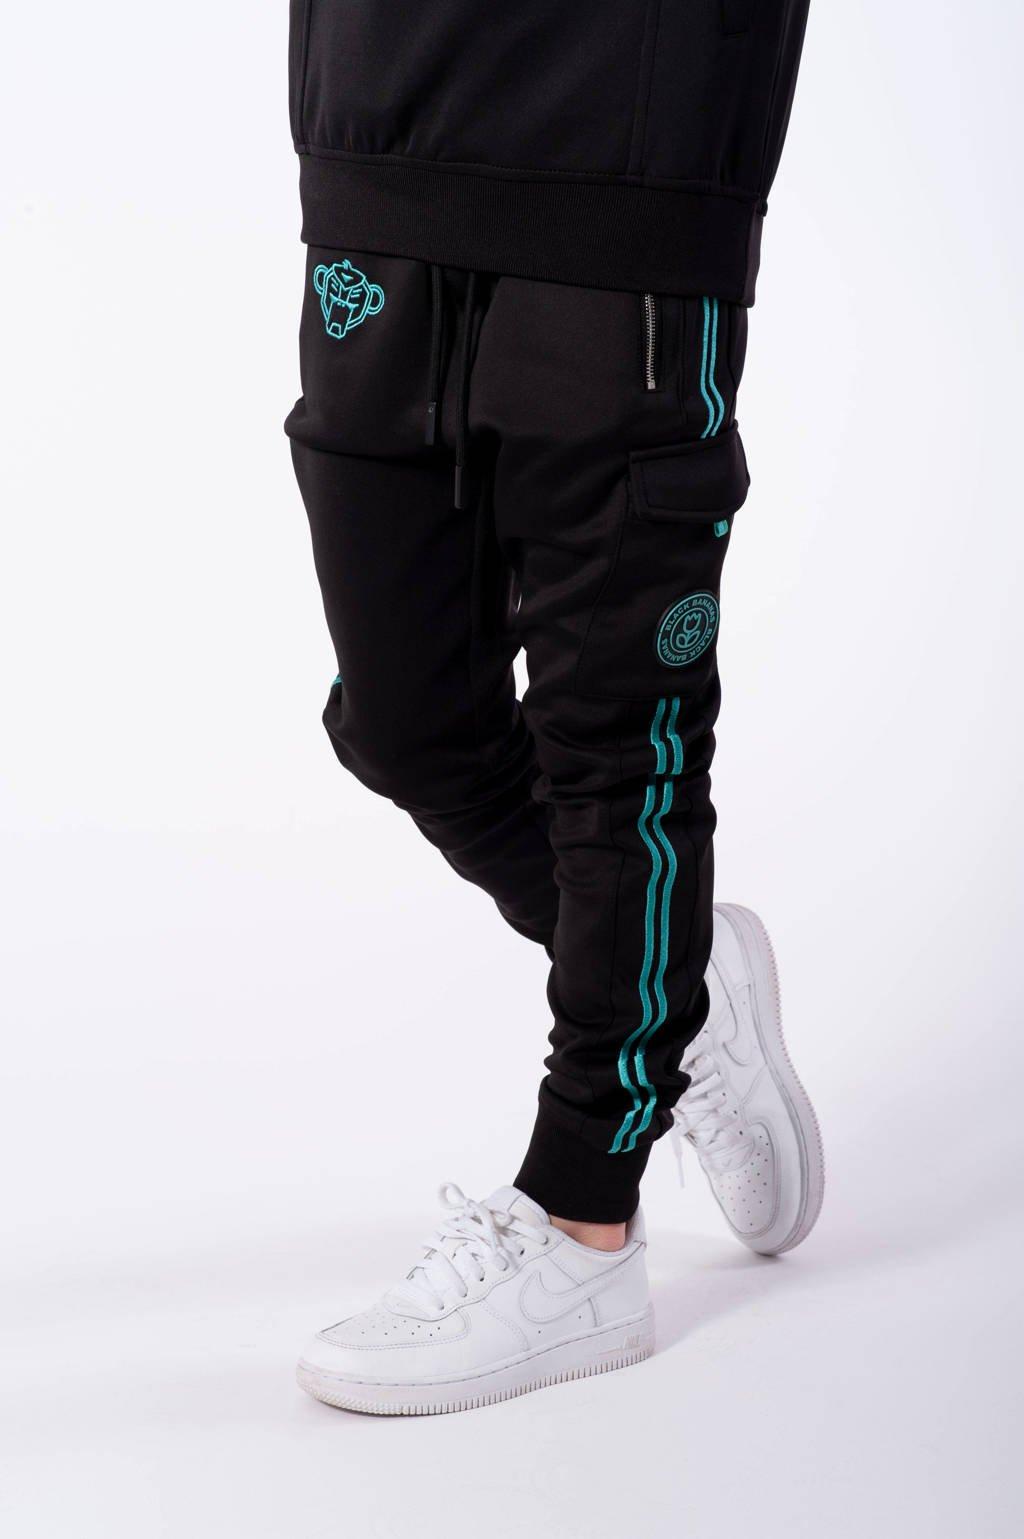 BLACK BANANAS unisex skinny broek Unity met logo zwart/blauw, Zwart/blauw